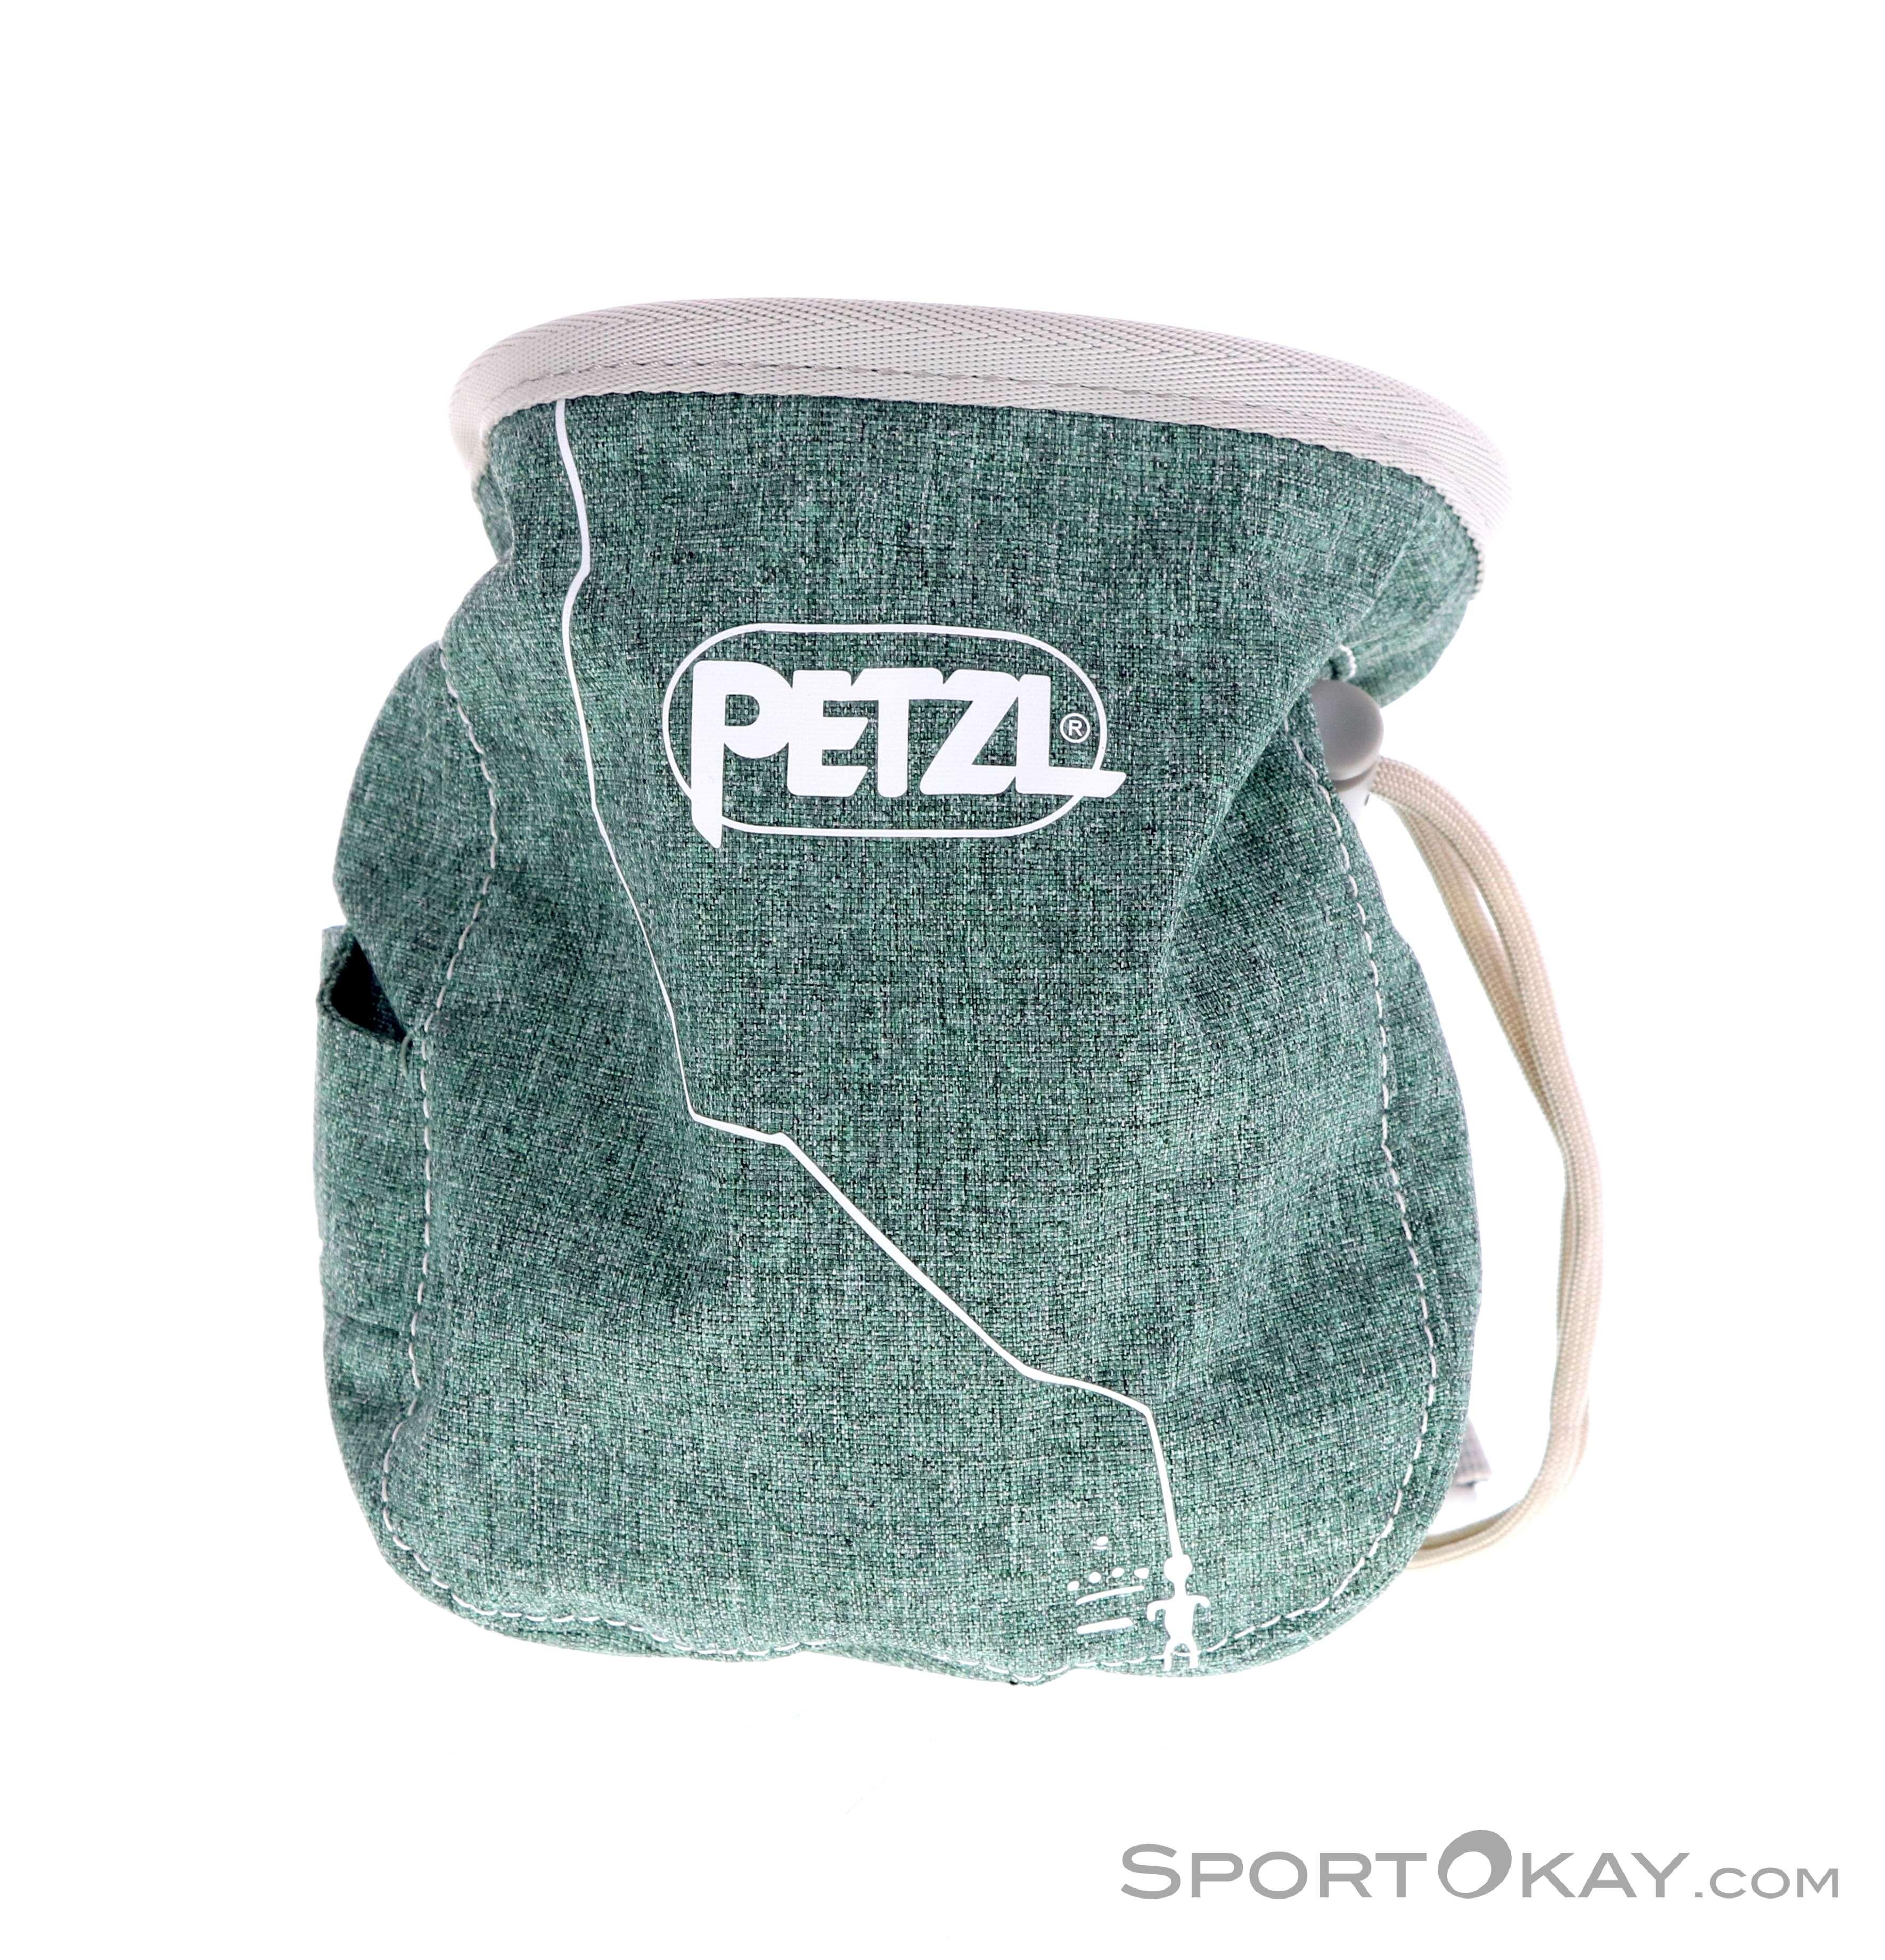 Petzl SAKA Chalk Bag Ergonomic Climbing Bouldering Holder Carry 2018